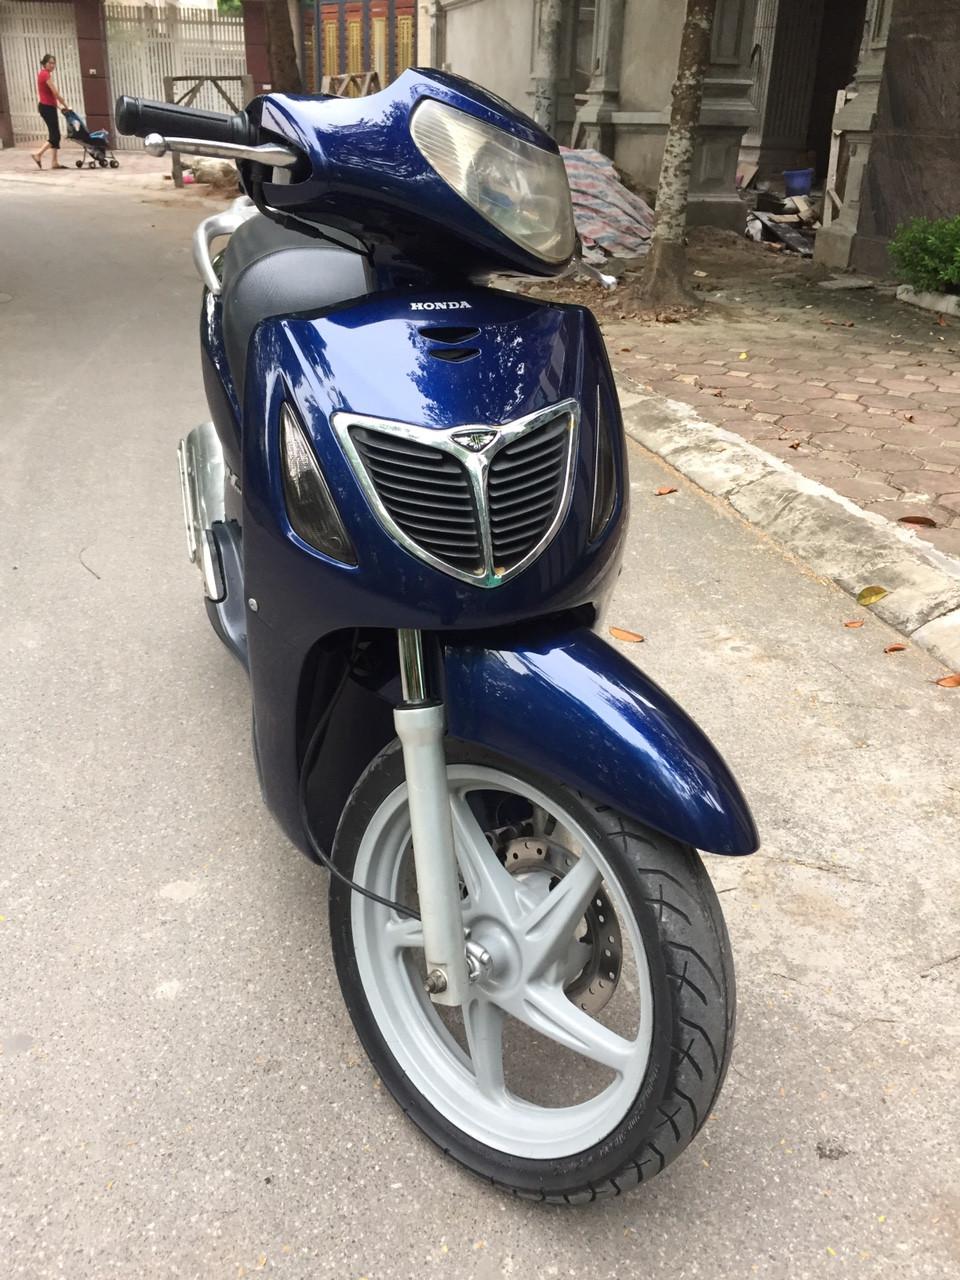 Can ban Honda Sh 150 che thuong xanh tim bien Hn 29U may nguyen thuy 305tr